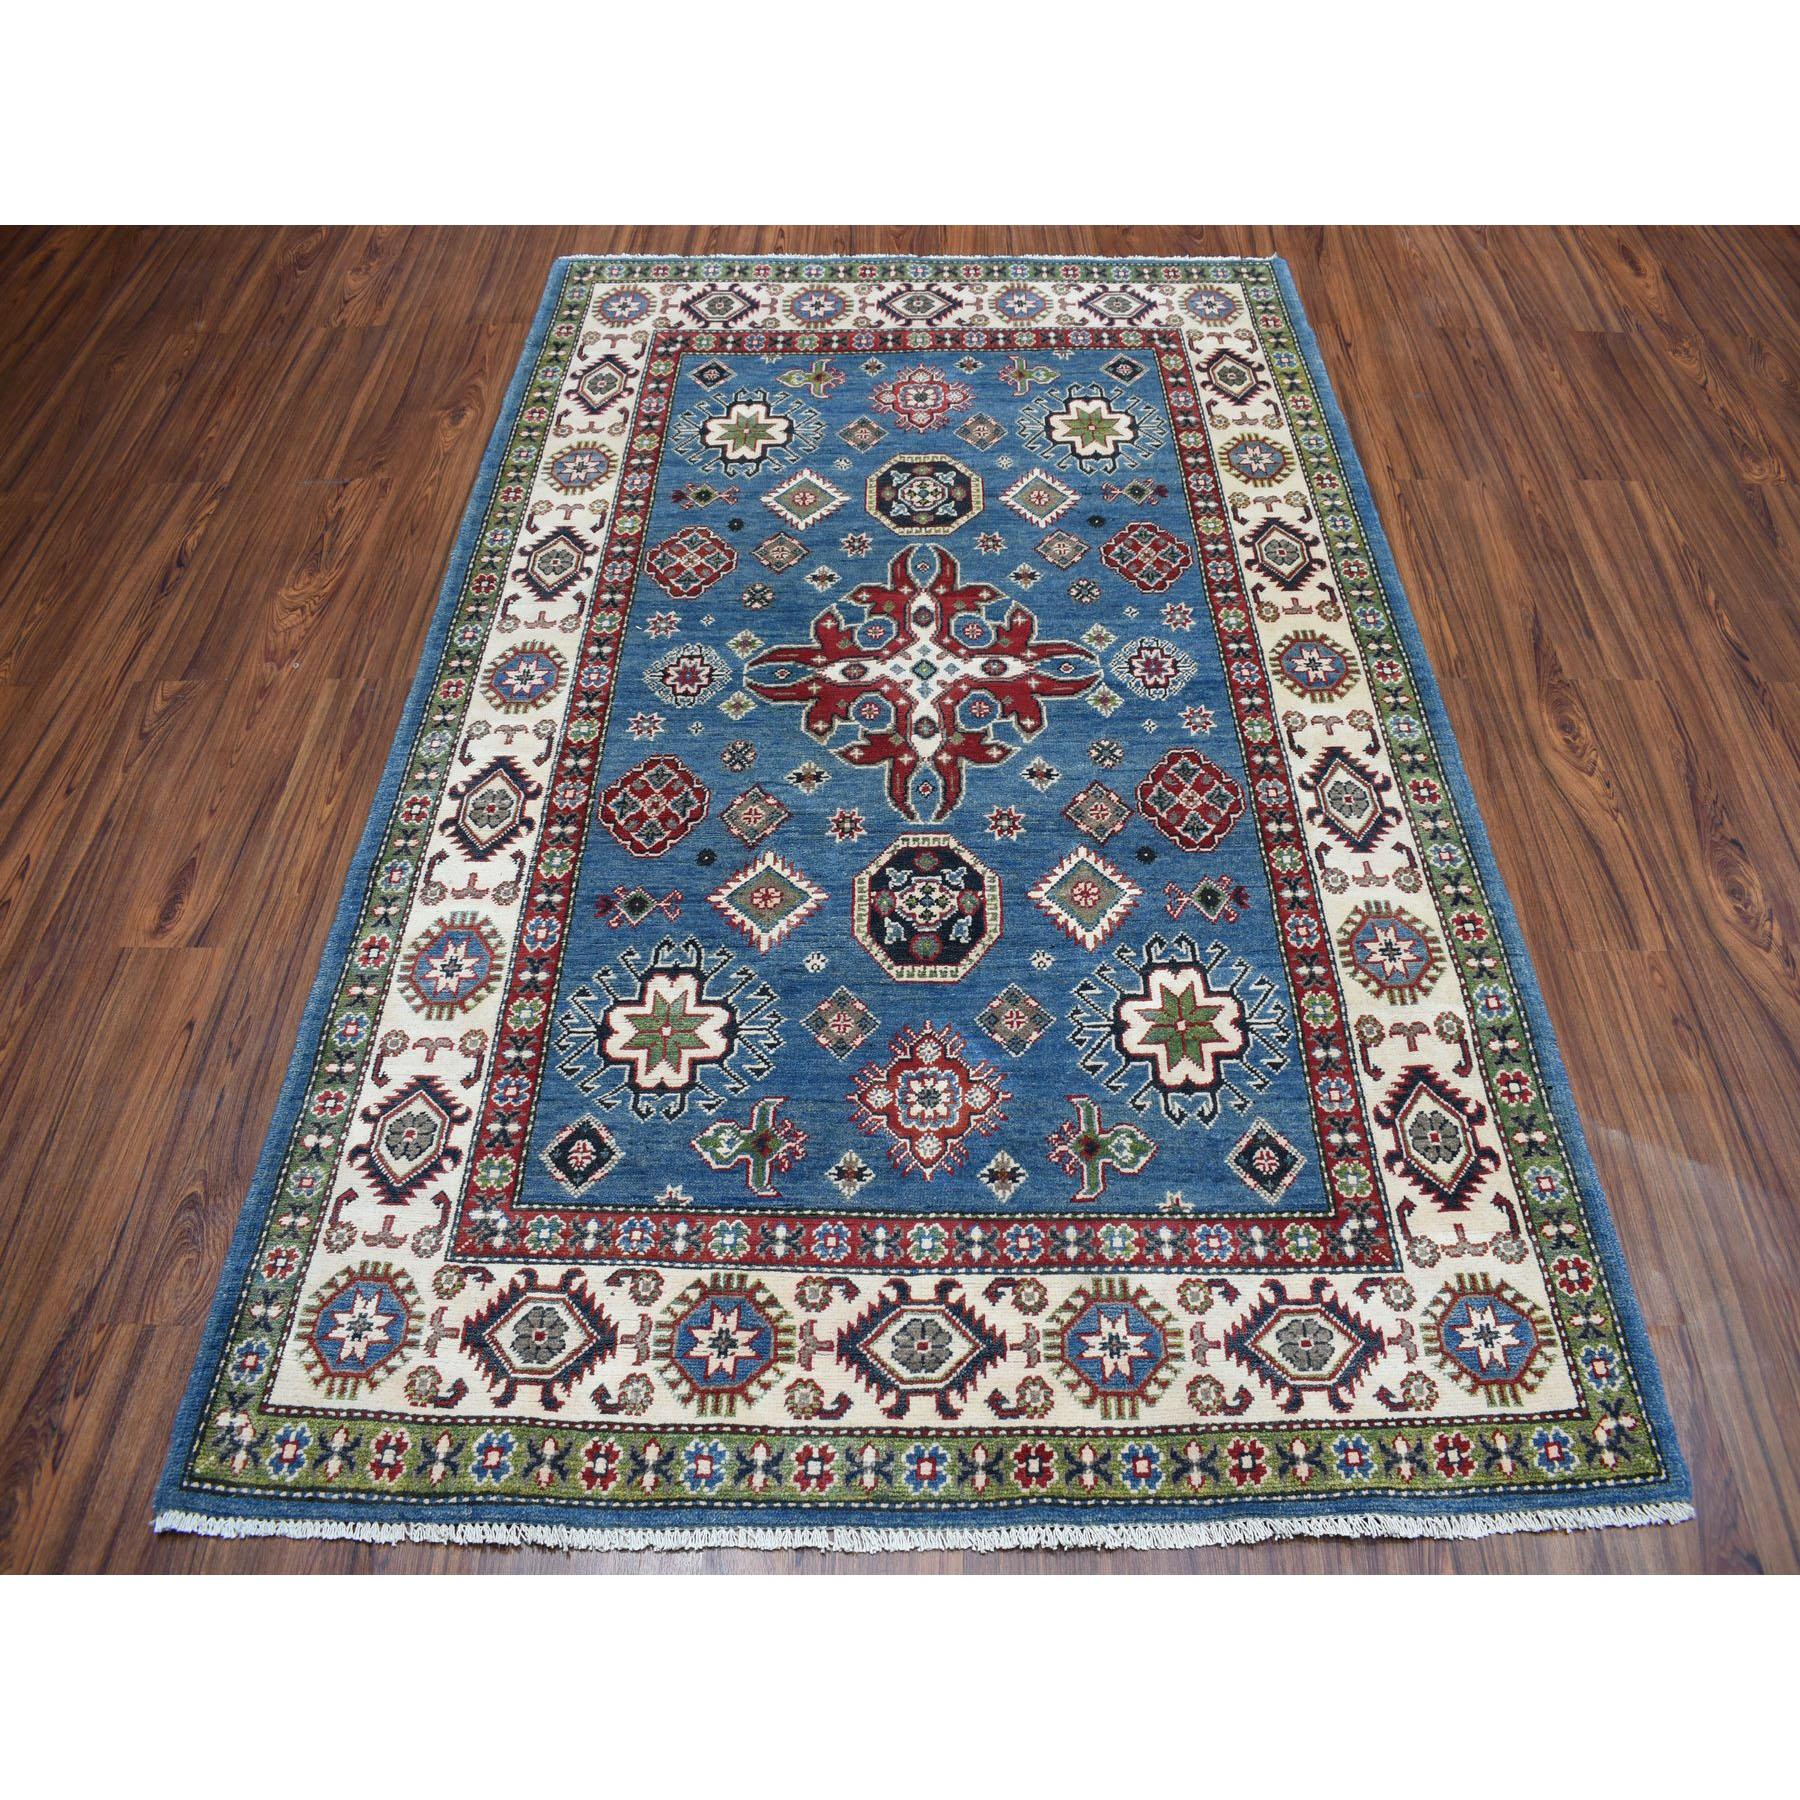 "4'10""x7'3"" Blue Geometric Design Kazak Pure Wool Hand-Knotted Oriental Rug"